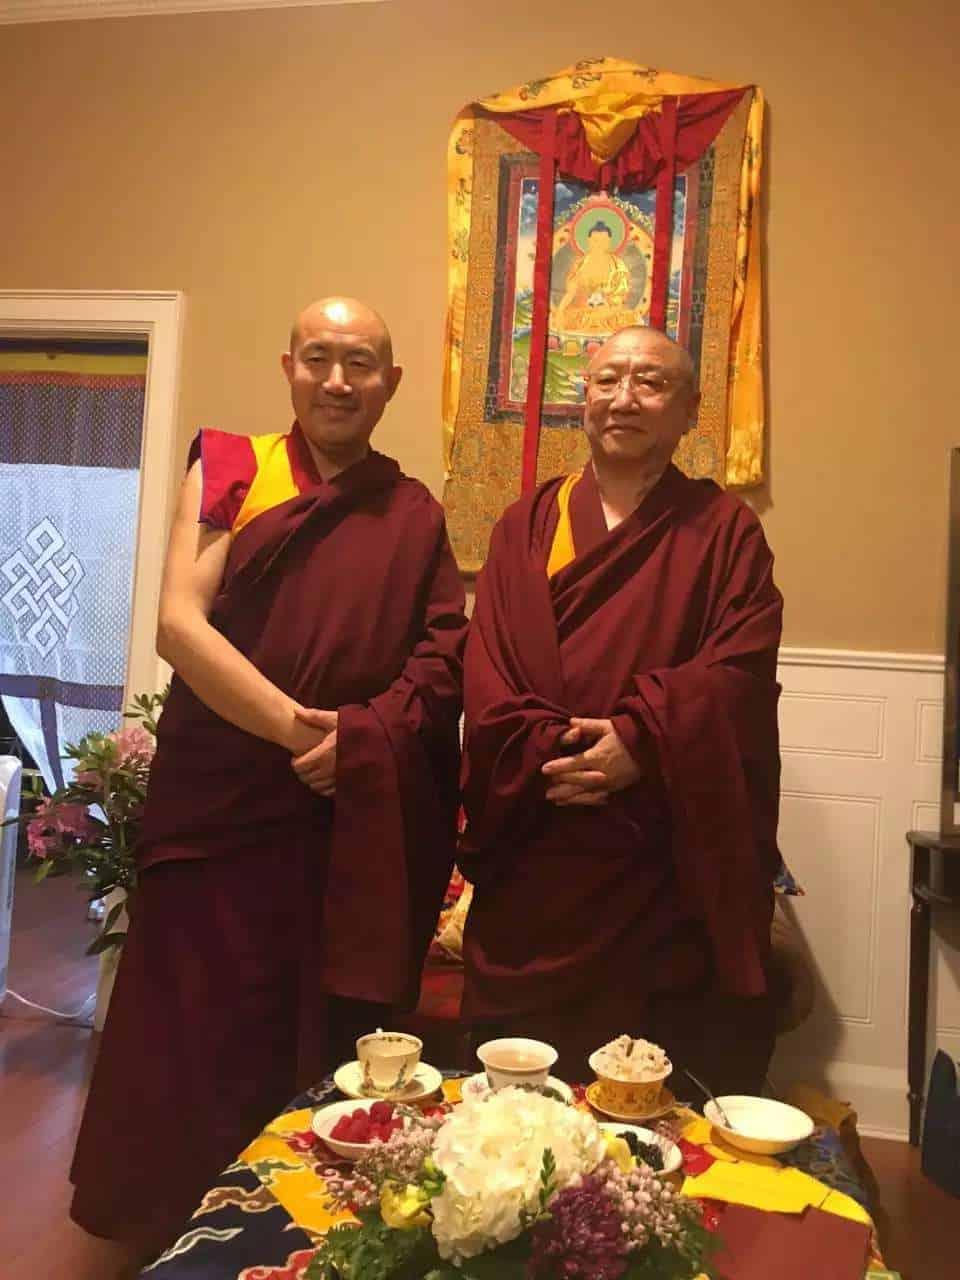 gosok-rinpoche-toronto-2016-4bbe5fbbf112107bb821e346189516d